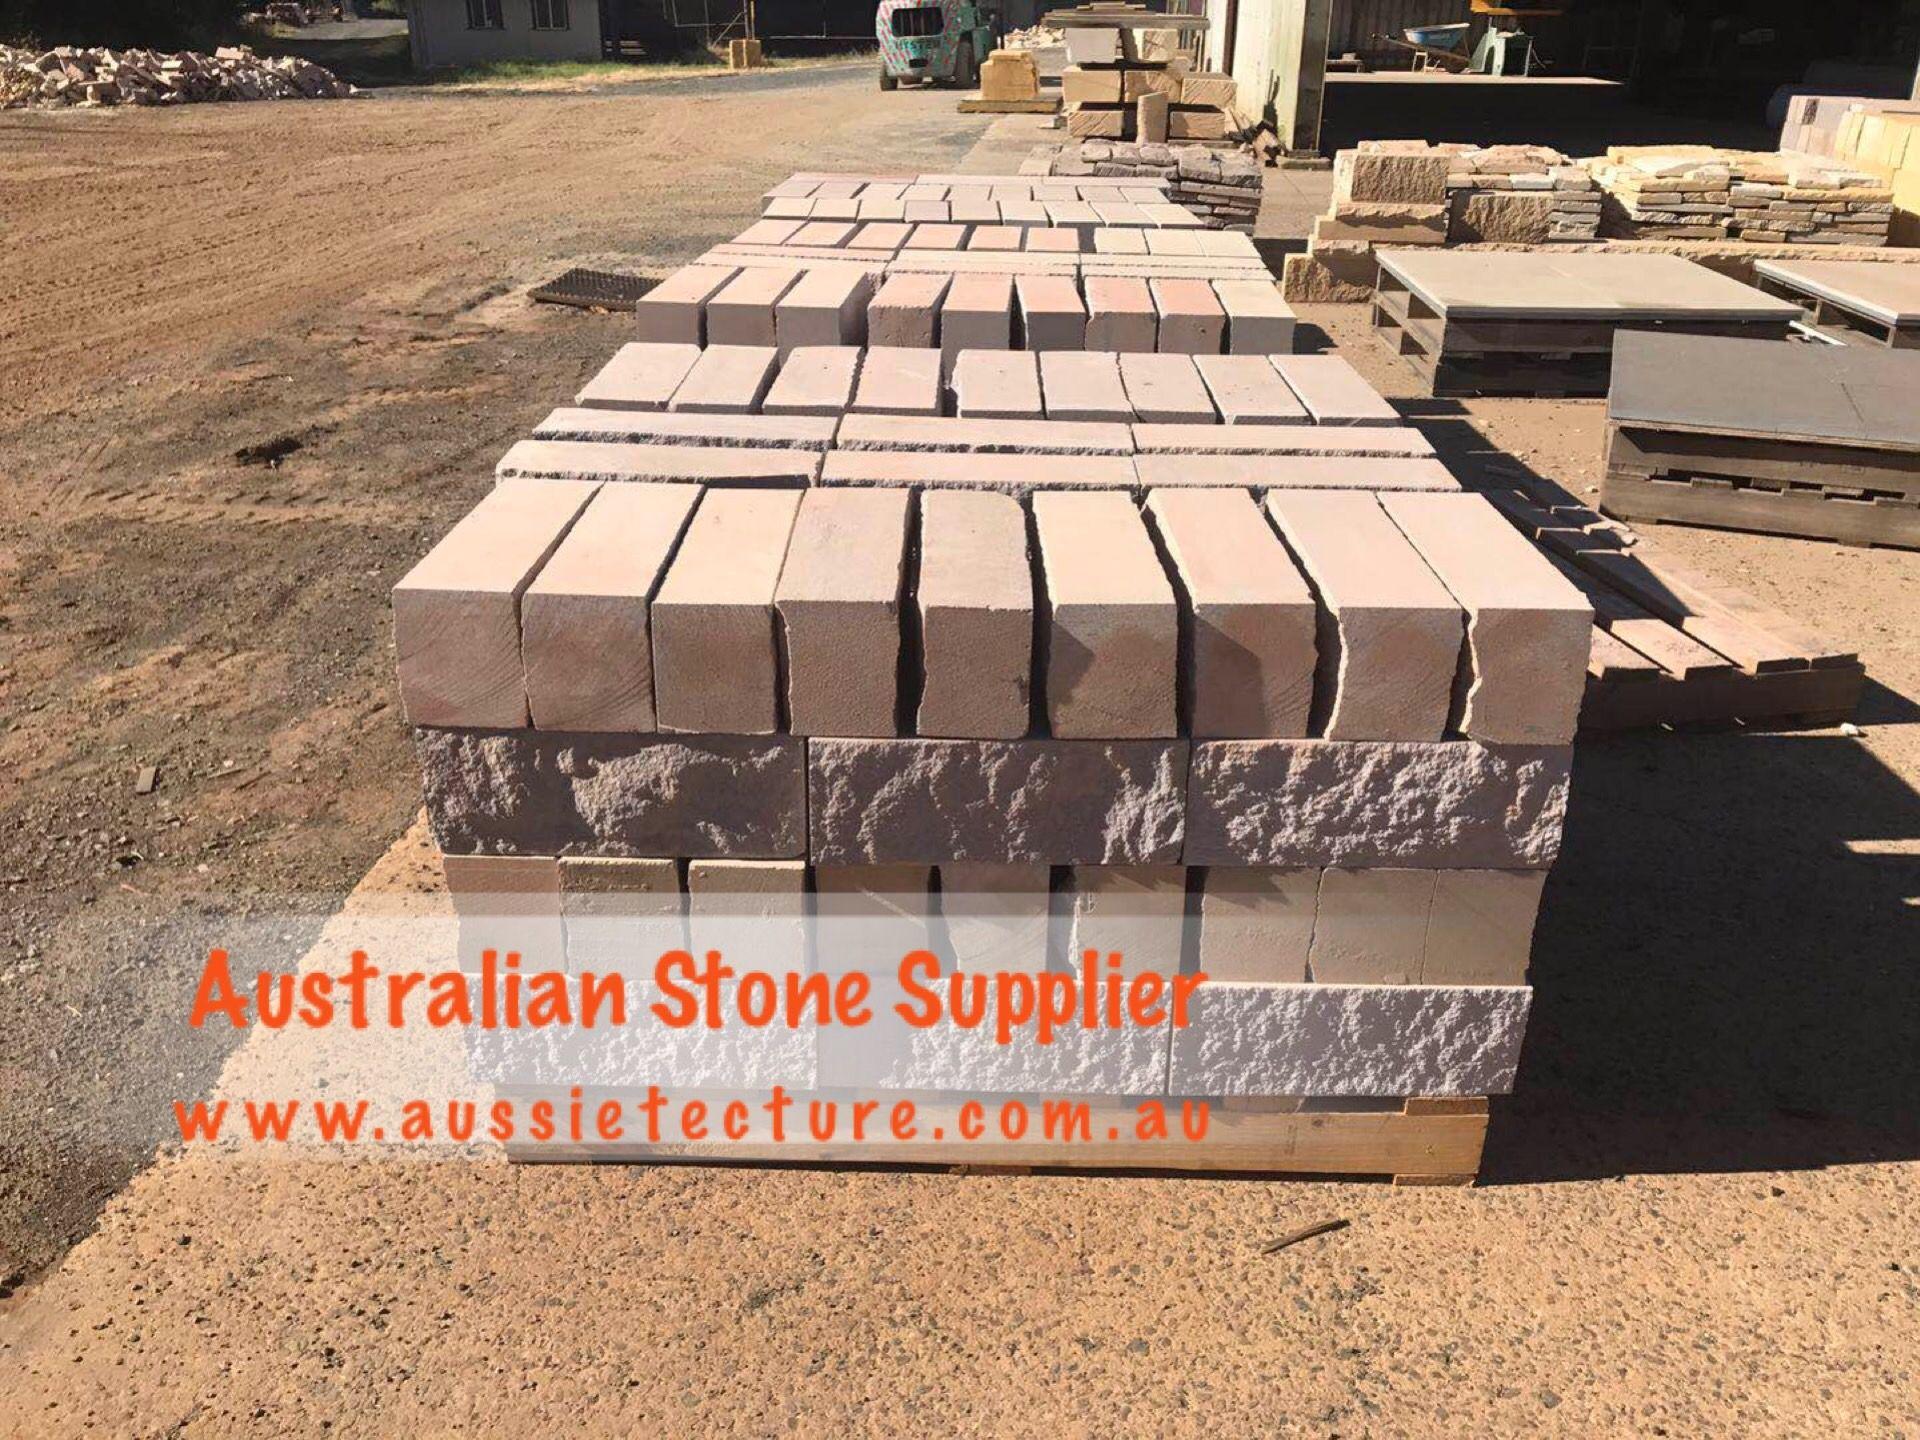 Australian Sandstone Paving Australian Sandstone Cladding Australian Sandstone Tiles Sandstone Flo Natural Stone Cladding Sandstone Wall Sandstone Fireplace